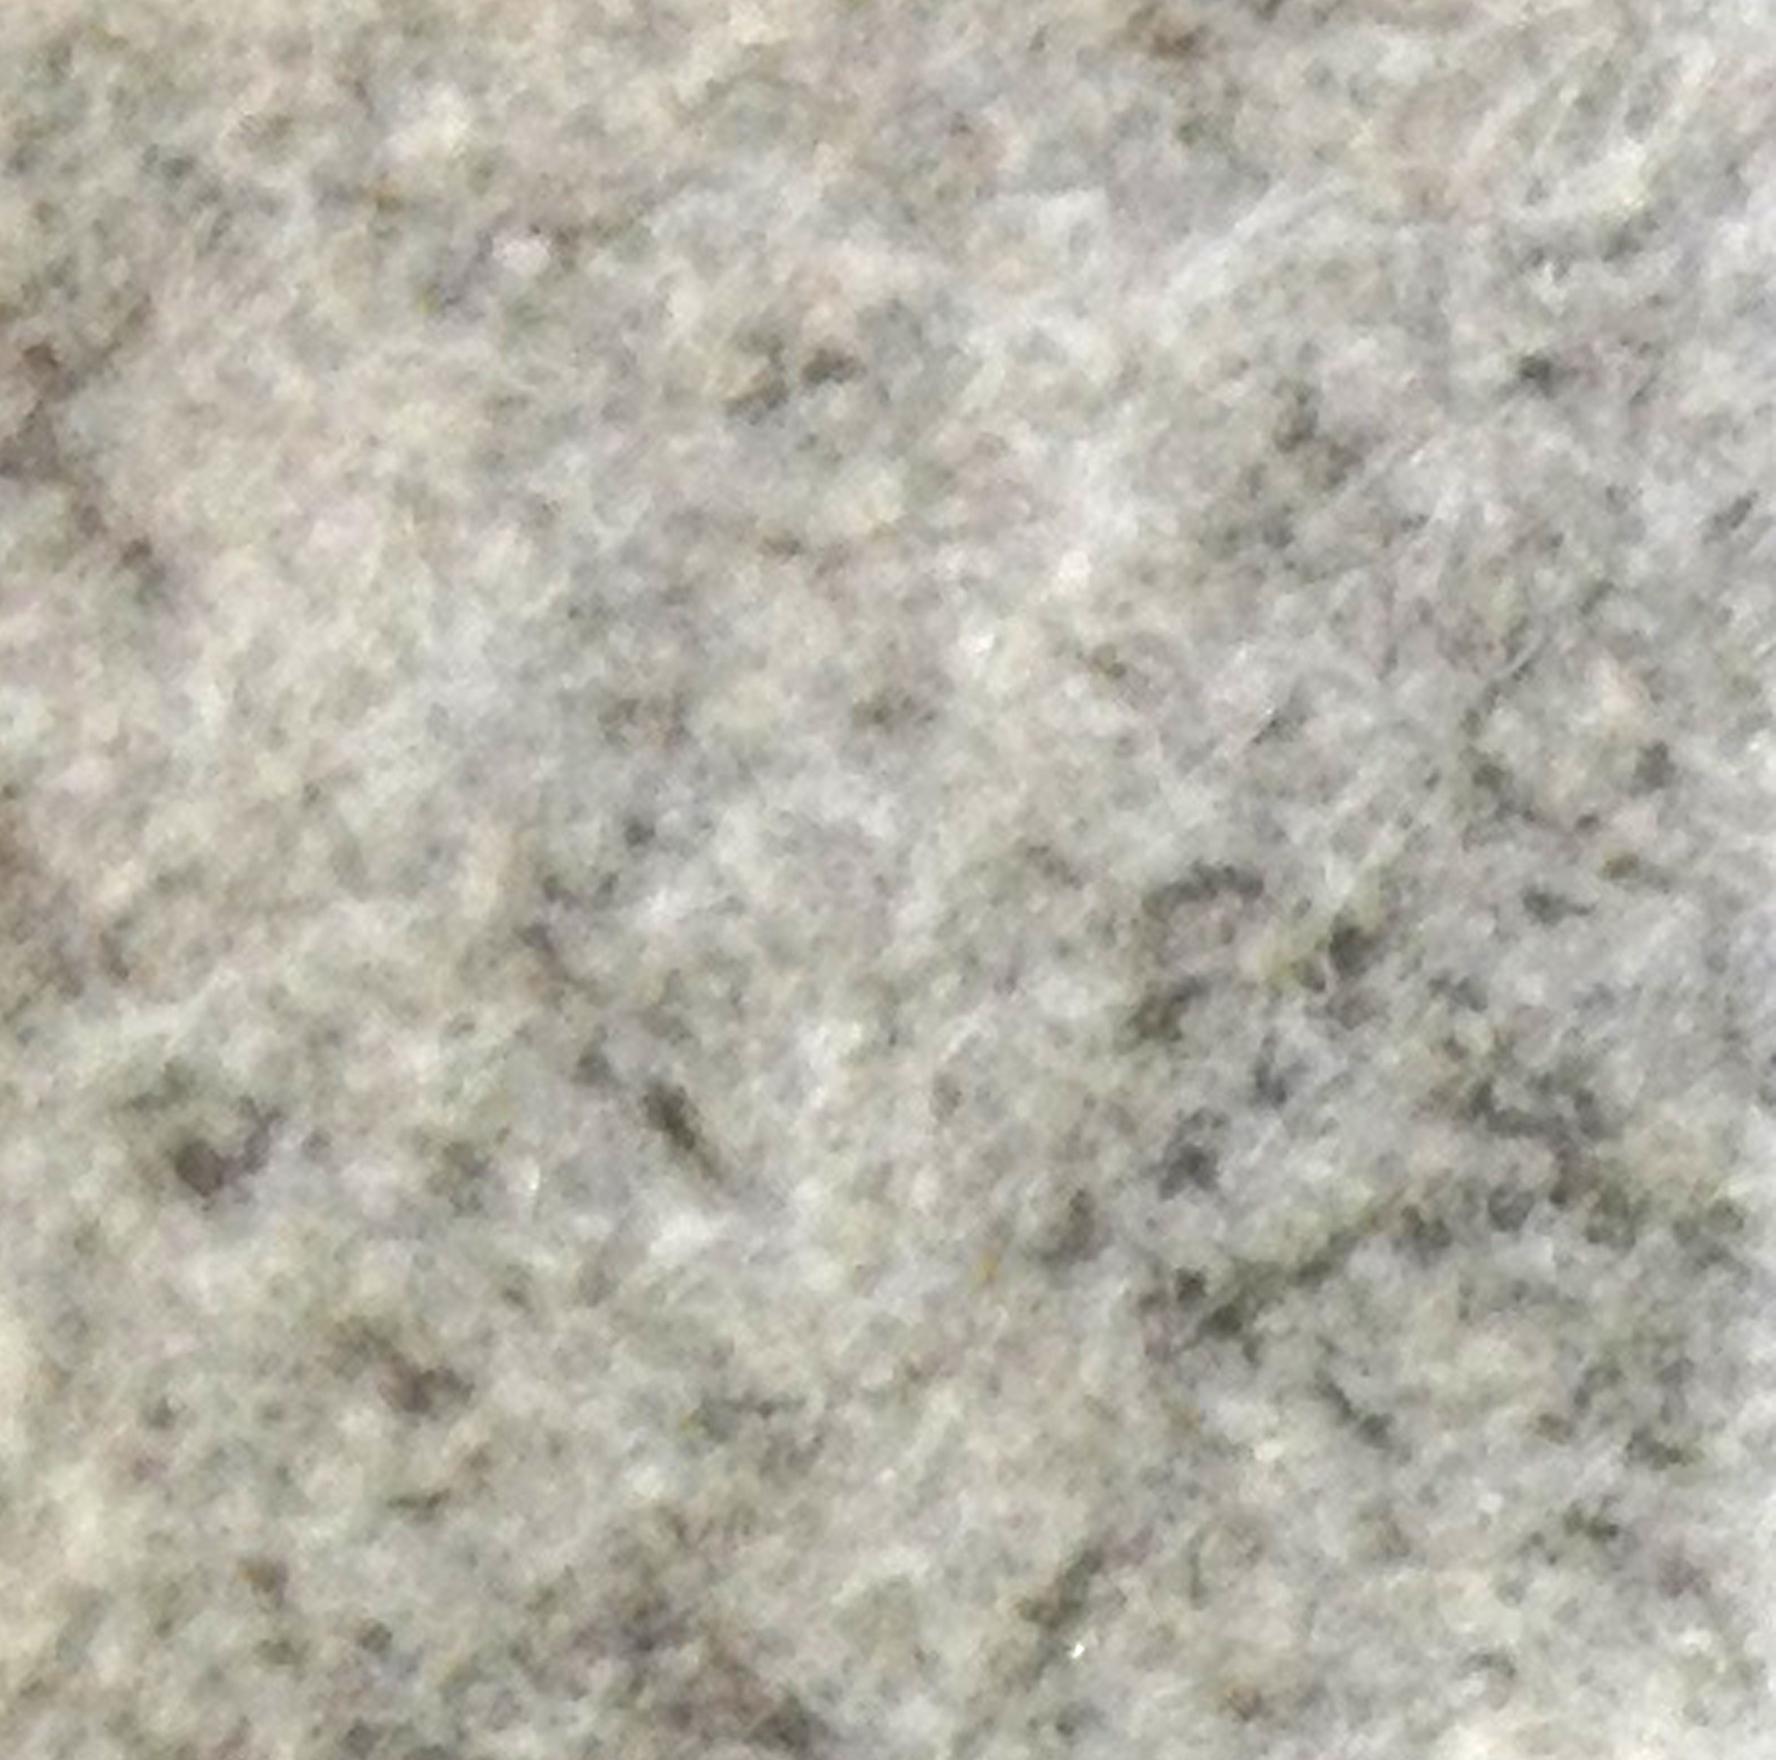 Solutions tech prod catalogue vente moquettes eco moq moquette gris clair chin materiel for Moquette ignifugee